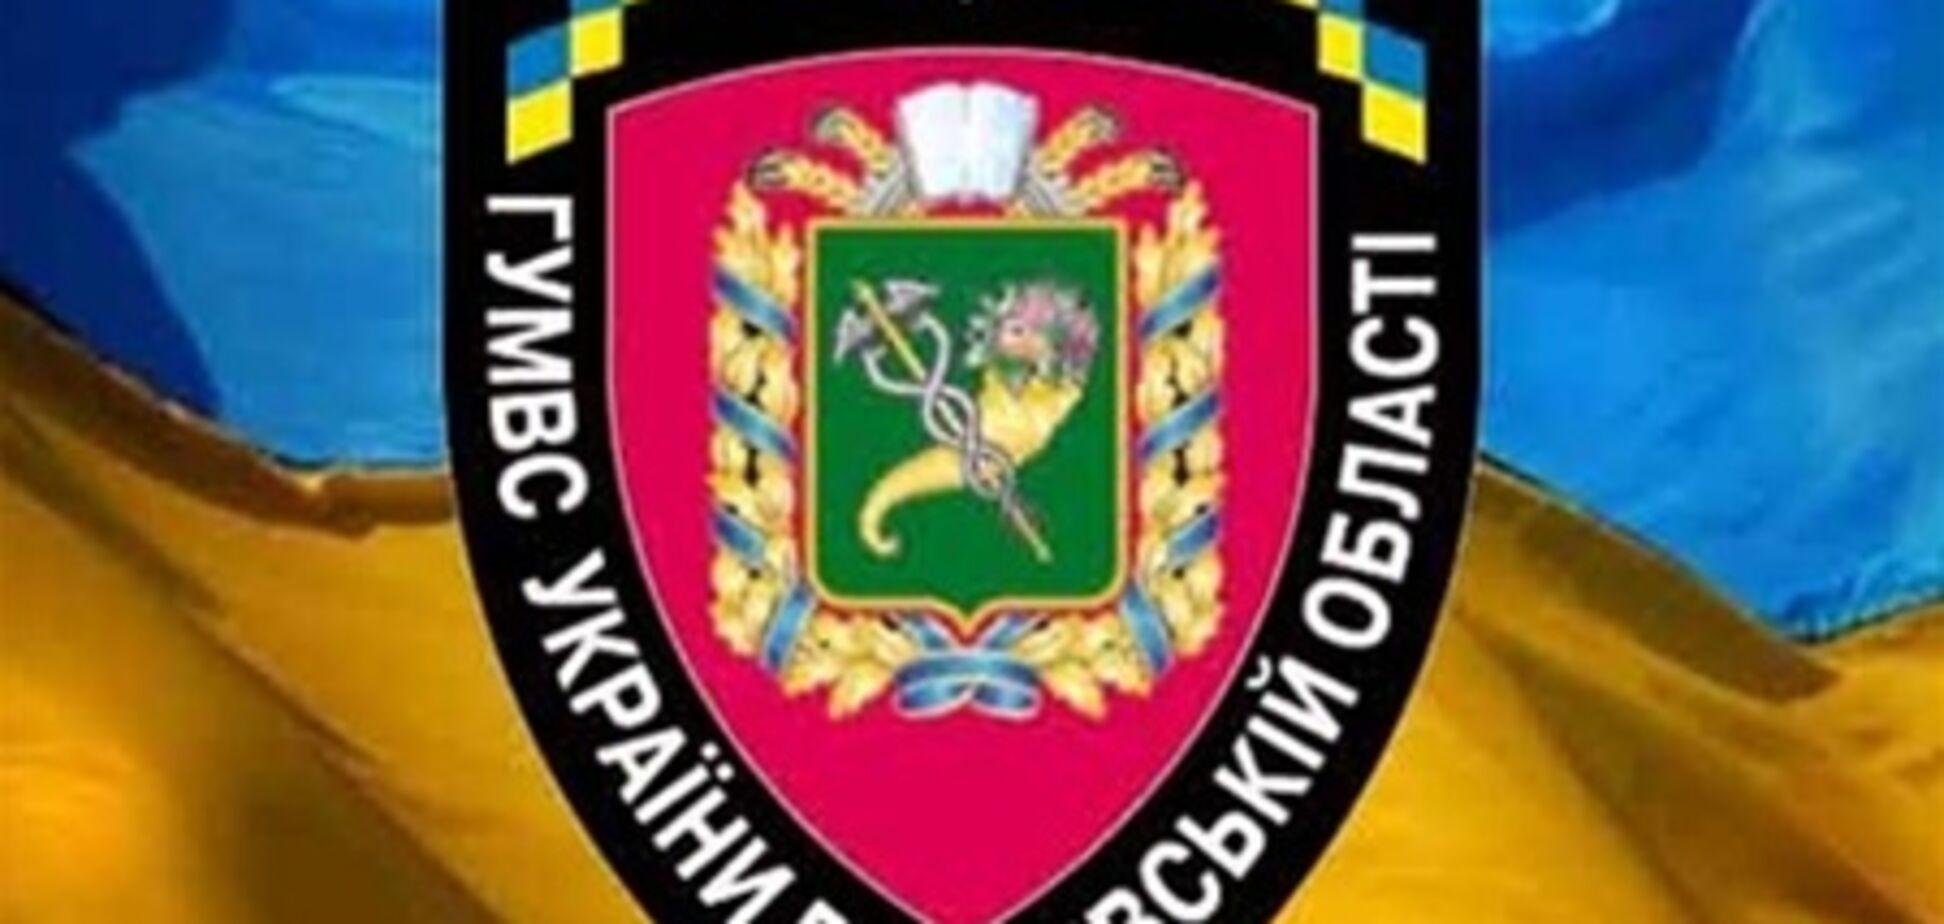 Милиция отрицает, что 'вешает' убийство судьи Трофимова на пенсионера